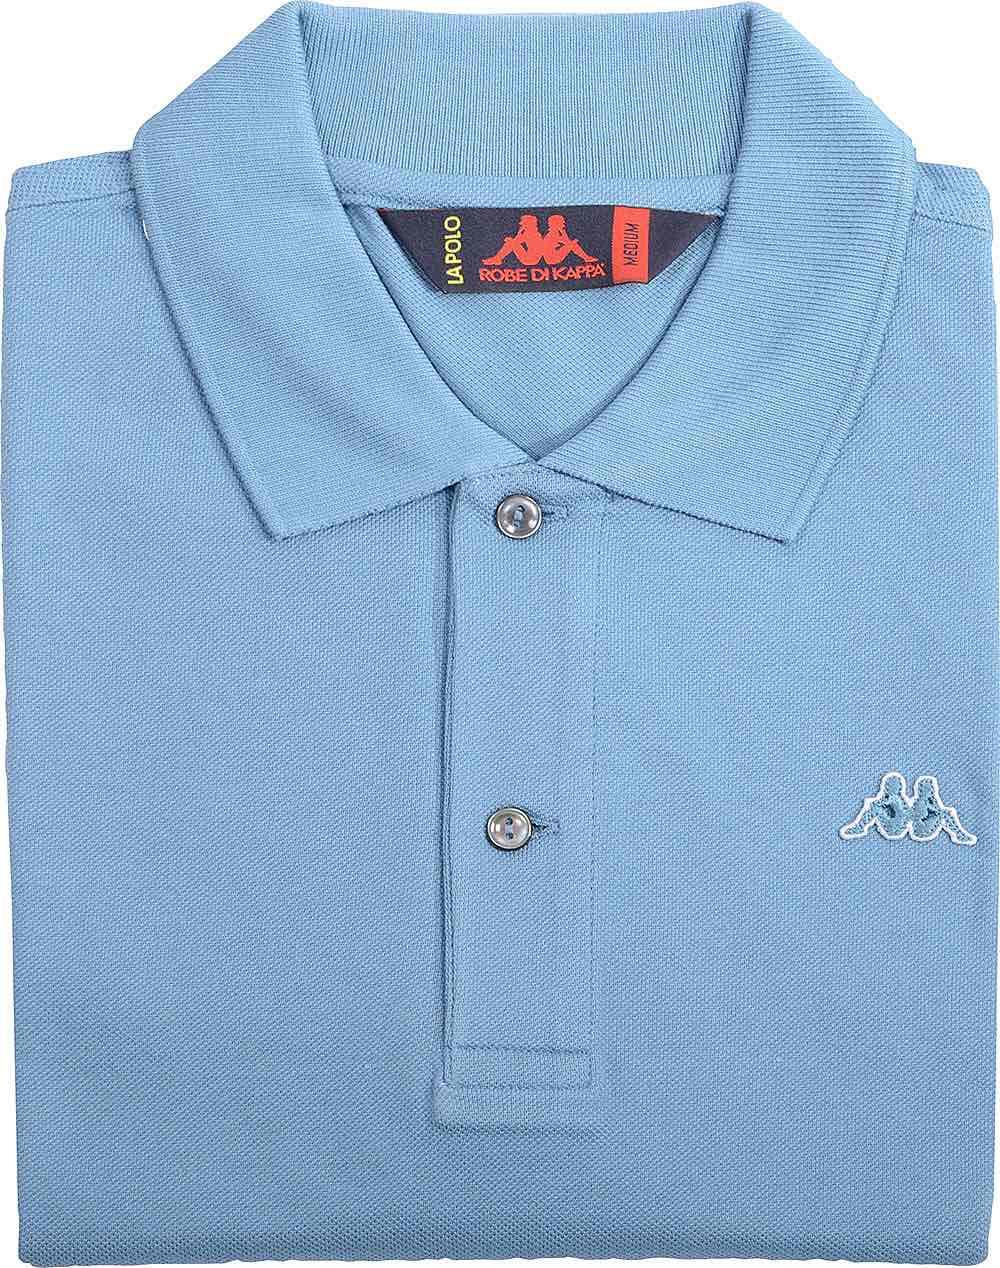 Kappa Polo T-Shirt Aarau 5€